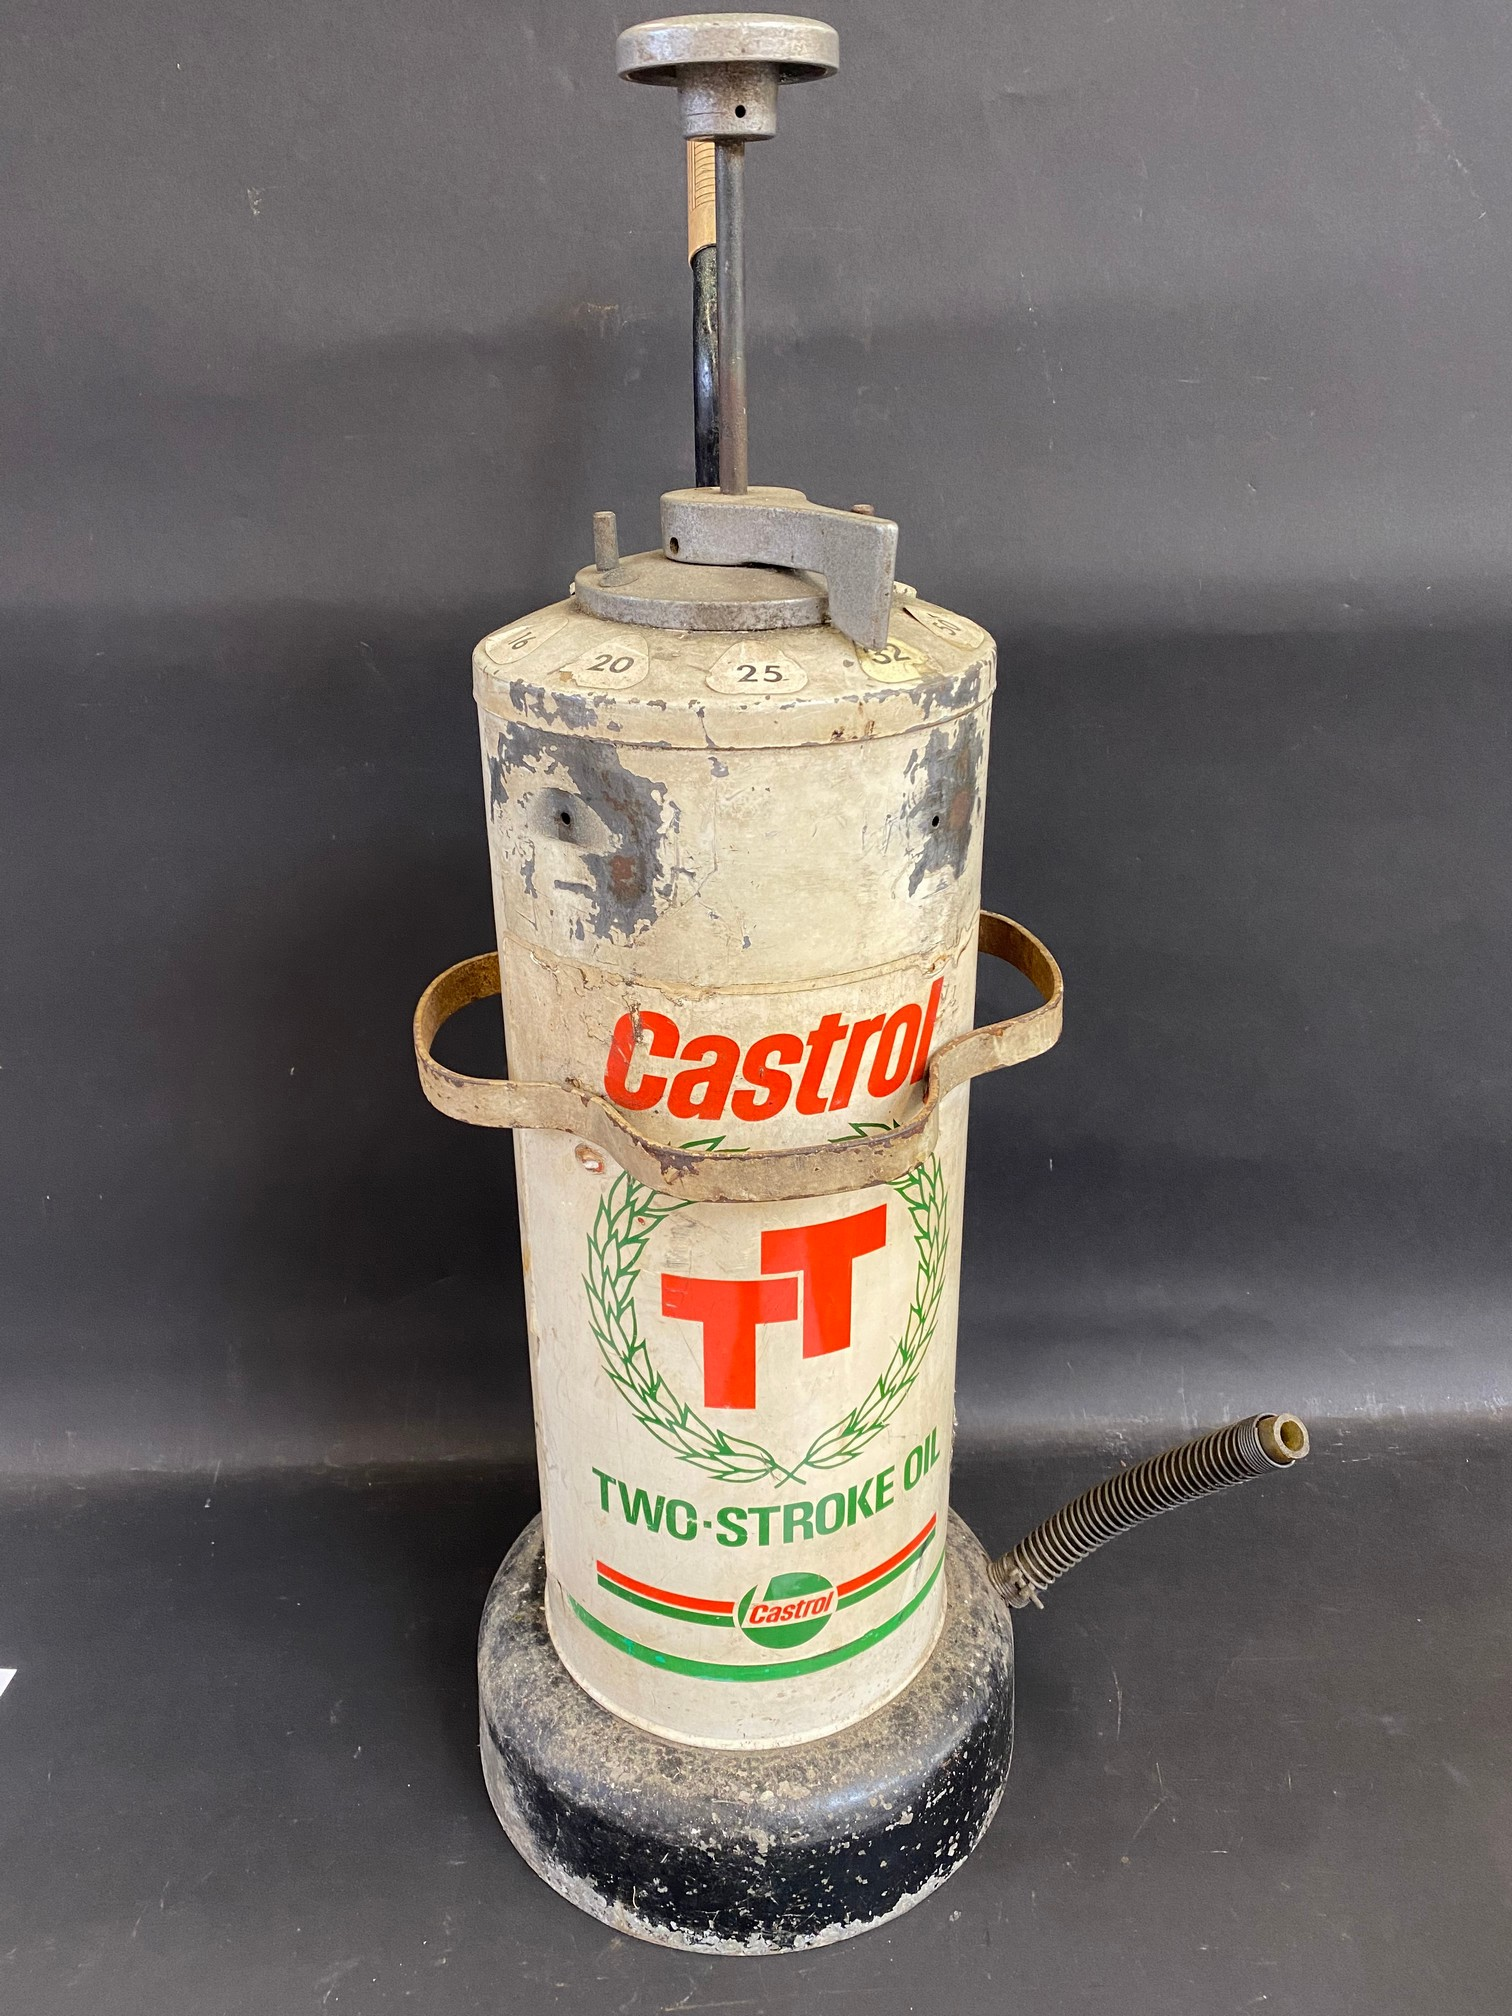 A Castrol TT two stroke and garage forecourt dispenser.